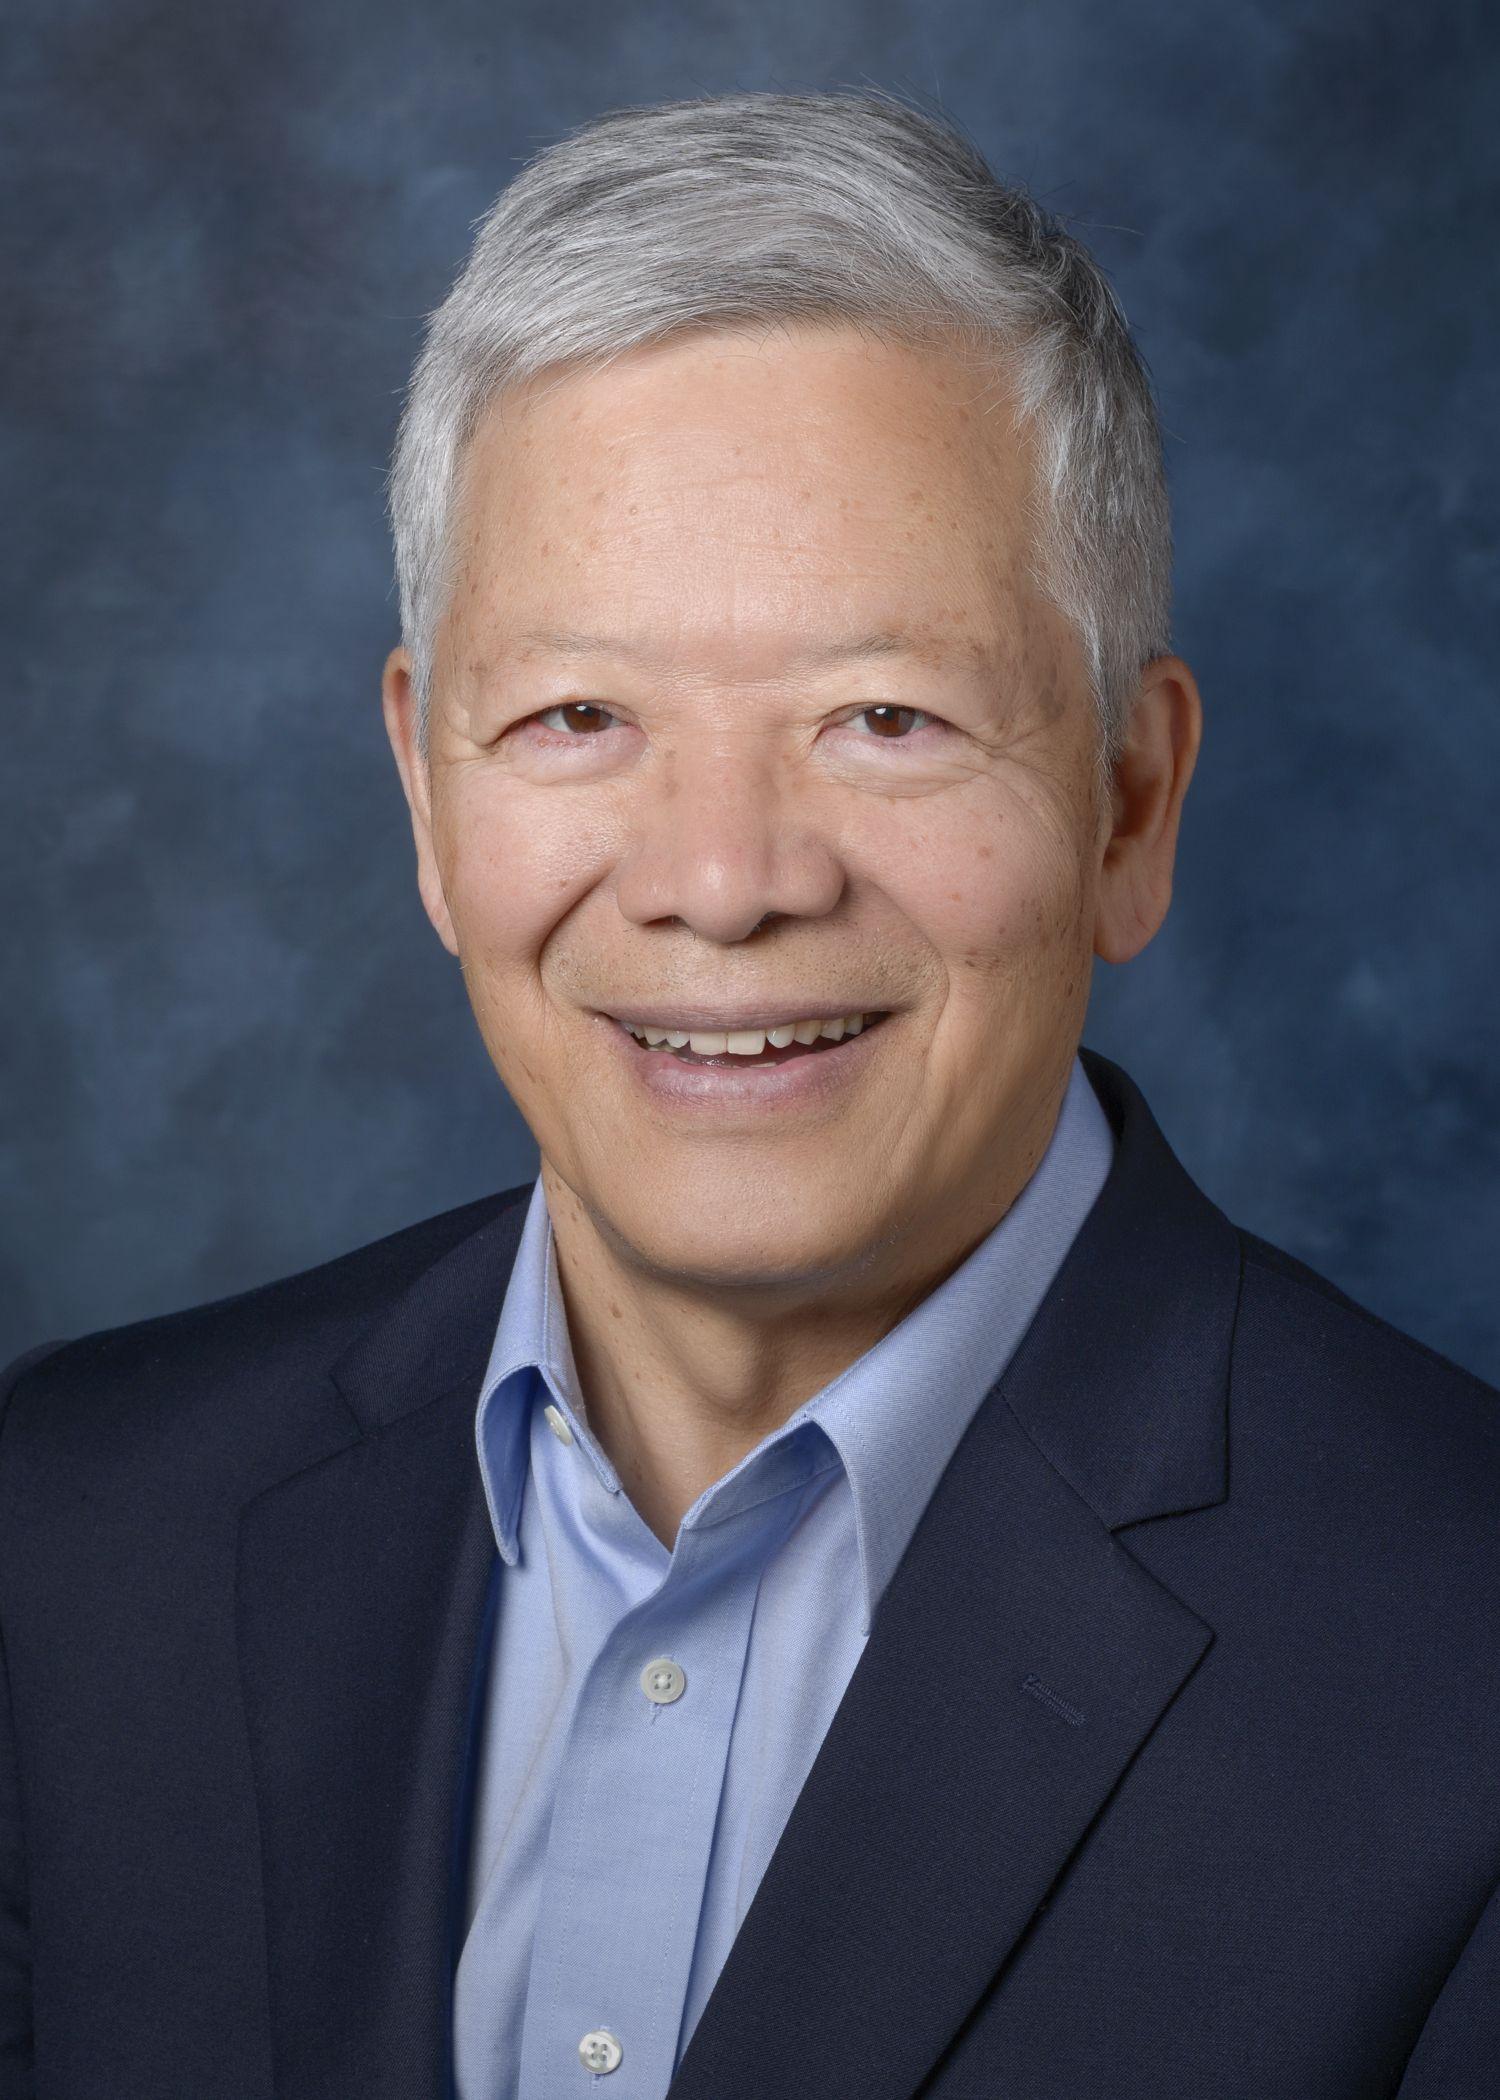 Portrait of Leland WK Chung